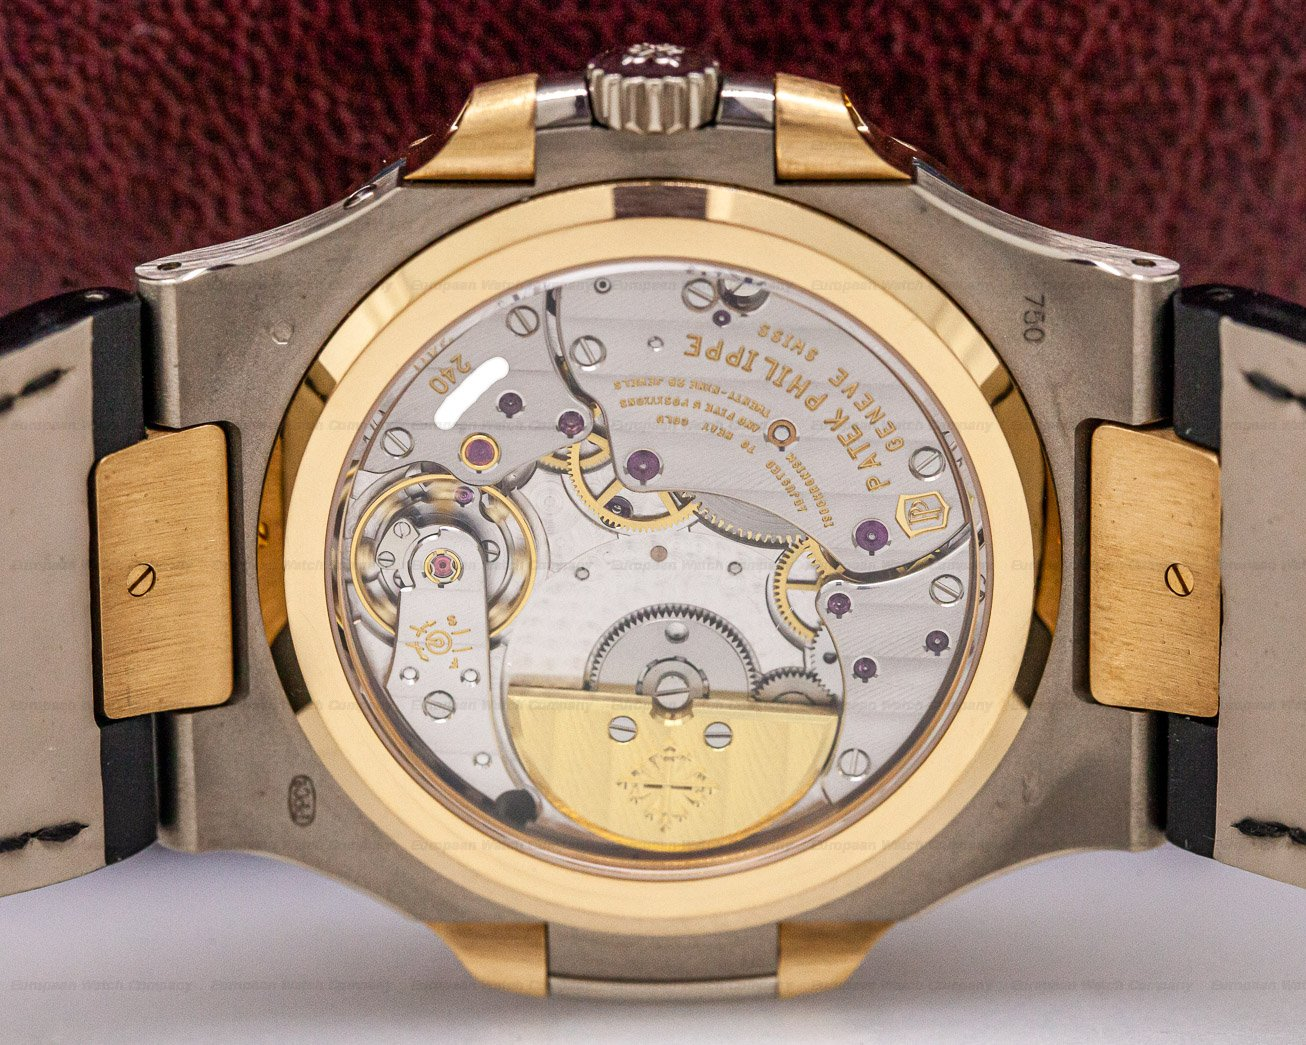 Patek Philippe 5712GR-001 Jumbo Nautilus 18K White / Rose Gold